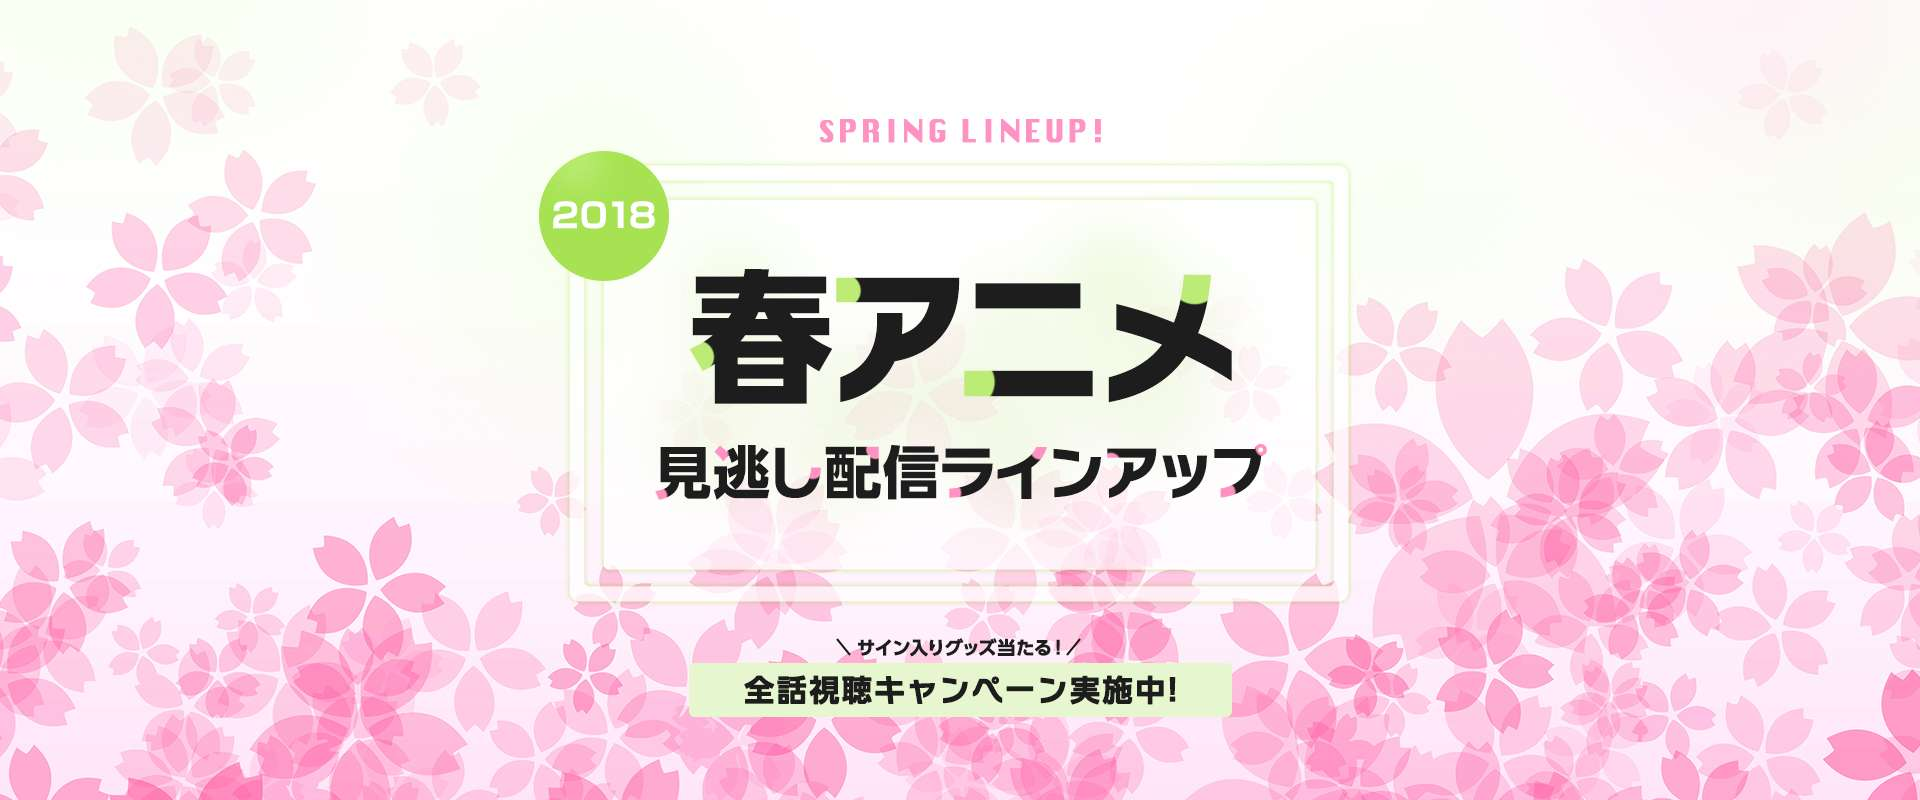 U-NEXT 春アニメ見逃しラインナップ